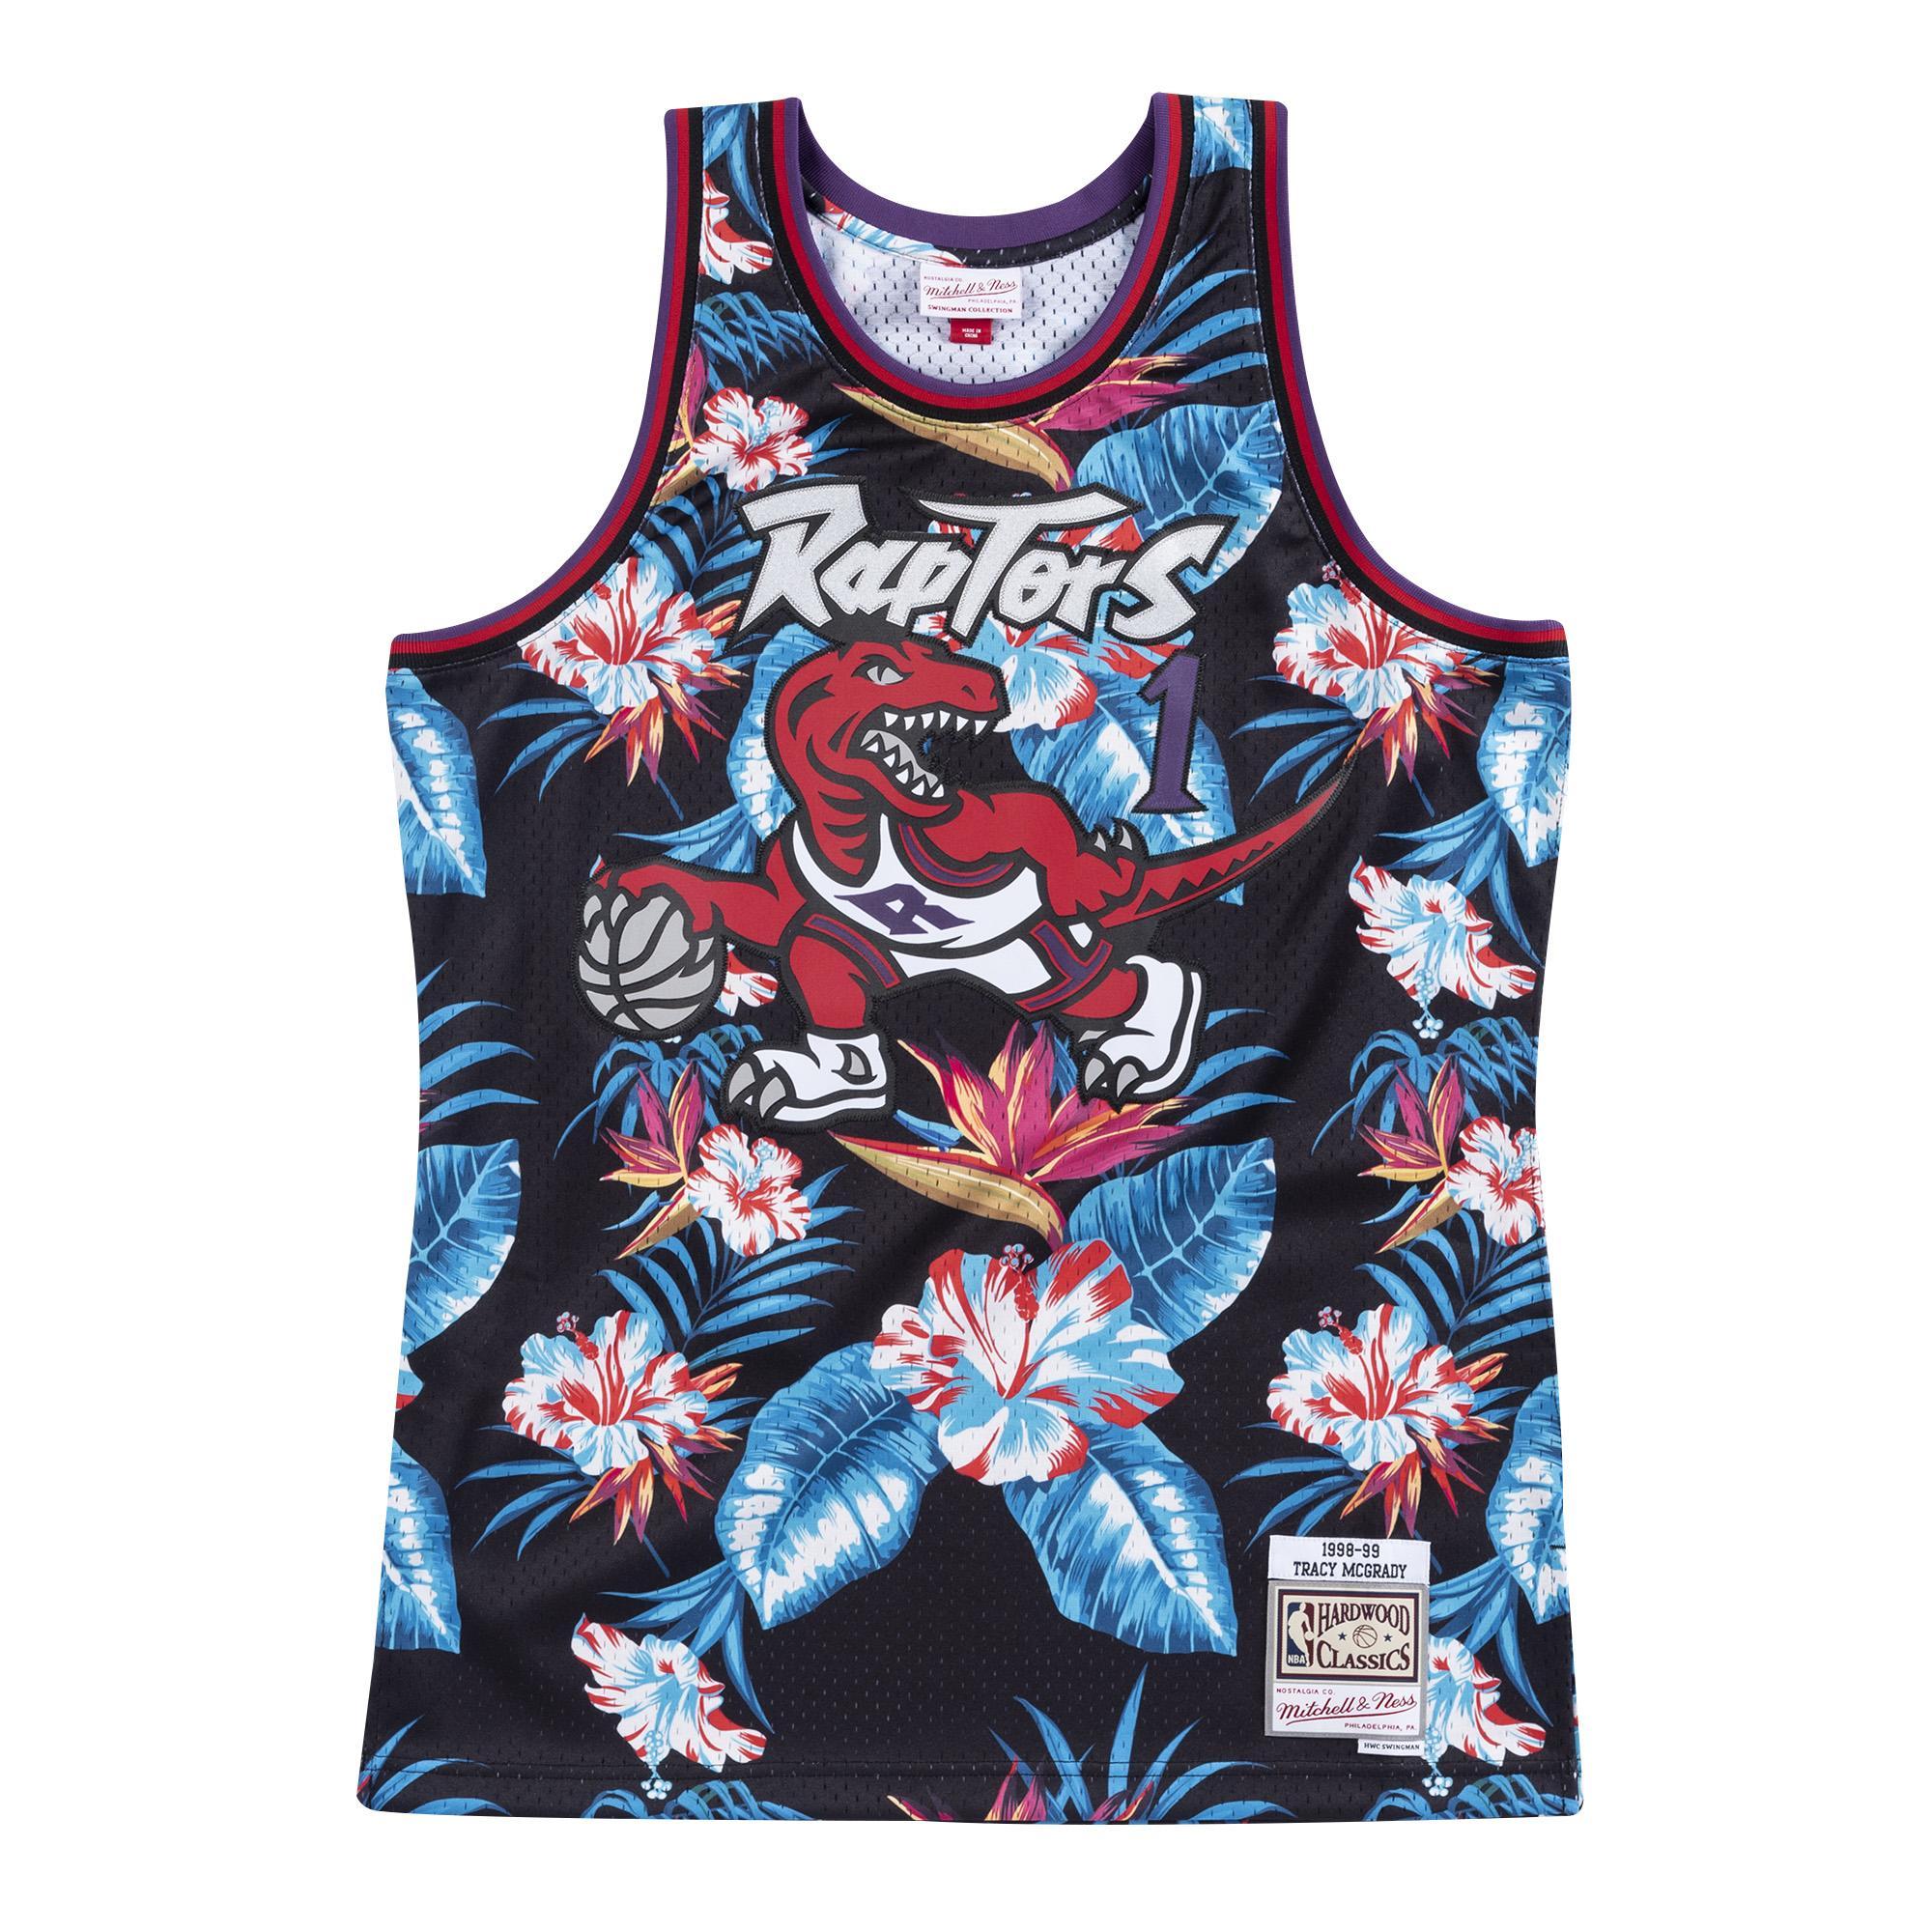 cheaper a3754 b780b Mitchell & Ness   Toronto Raptors Floral Black Swingman ...